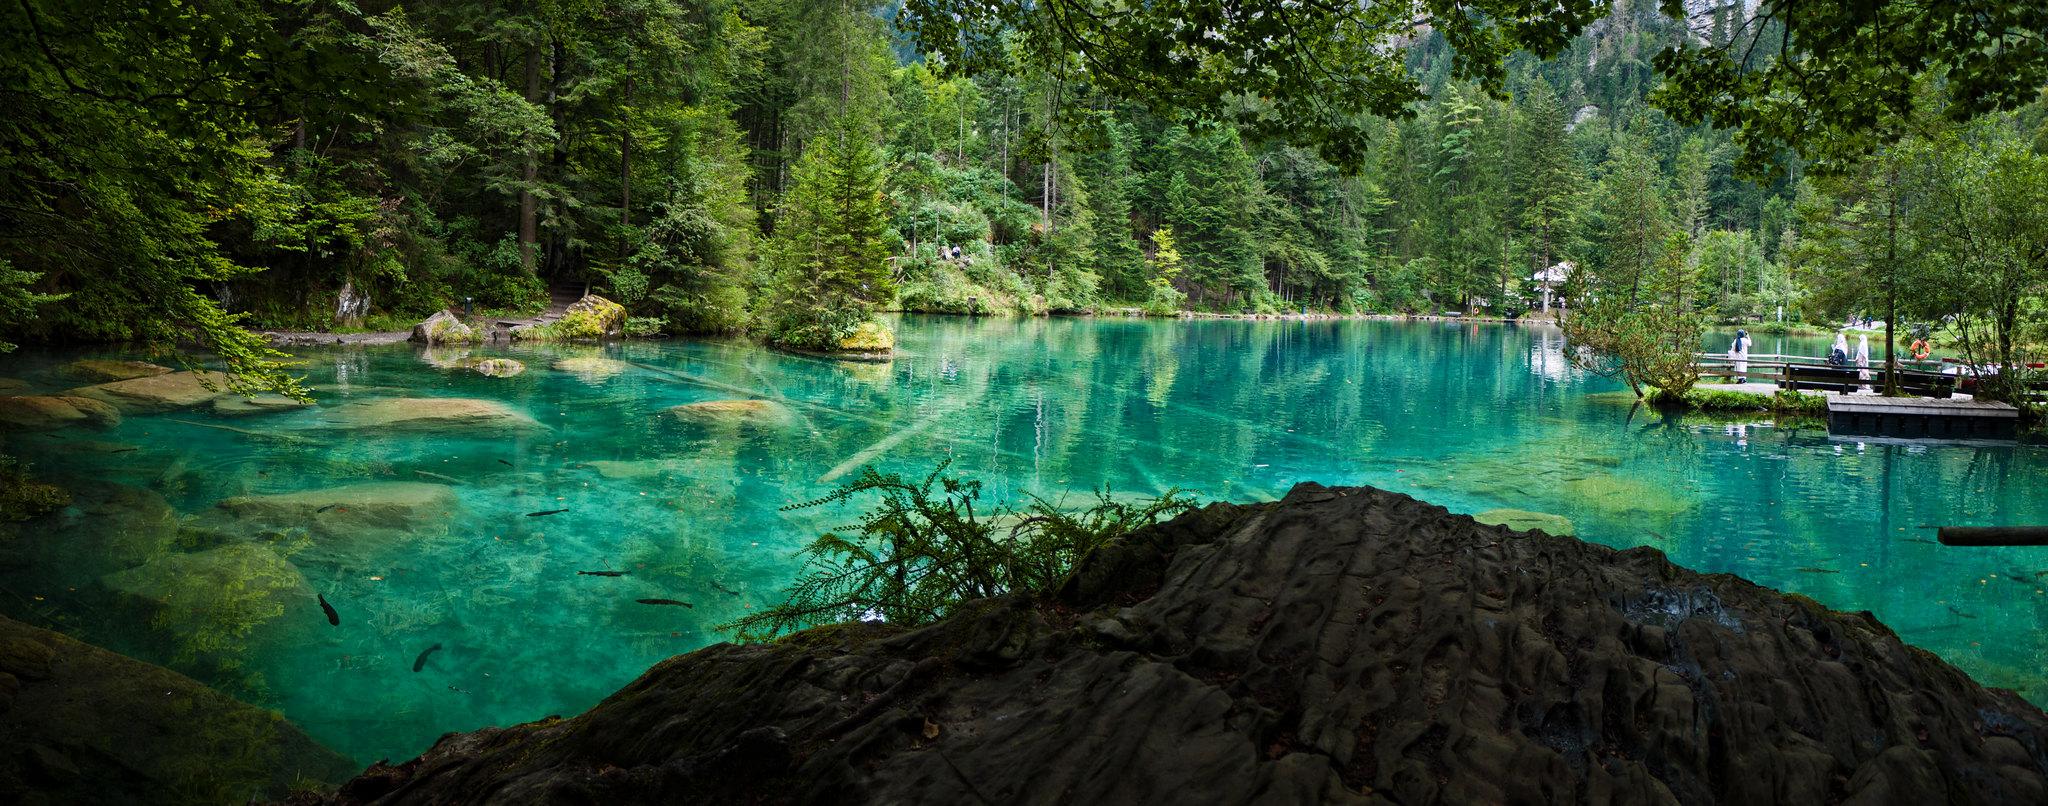 lago blu svizzera